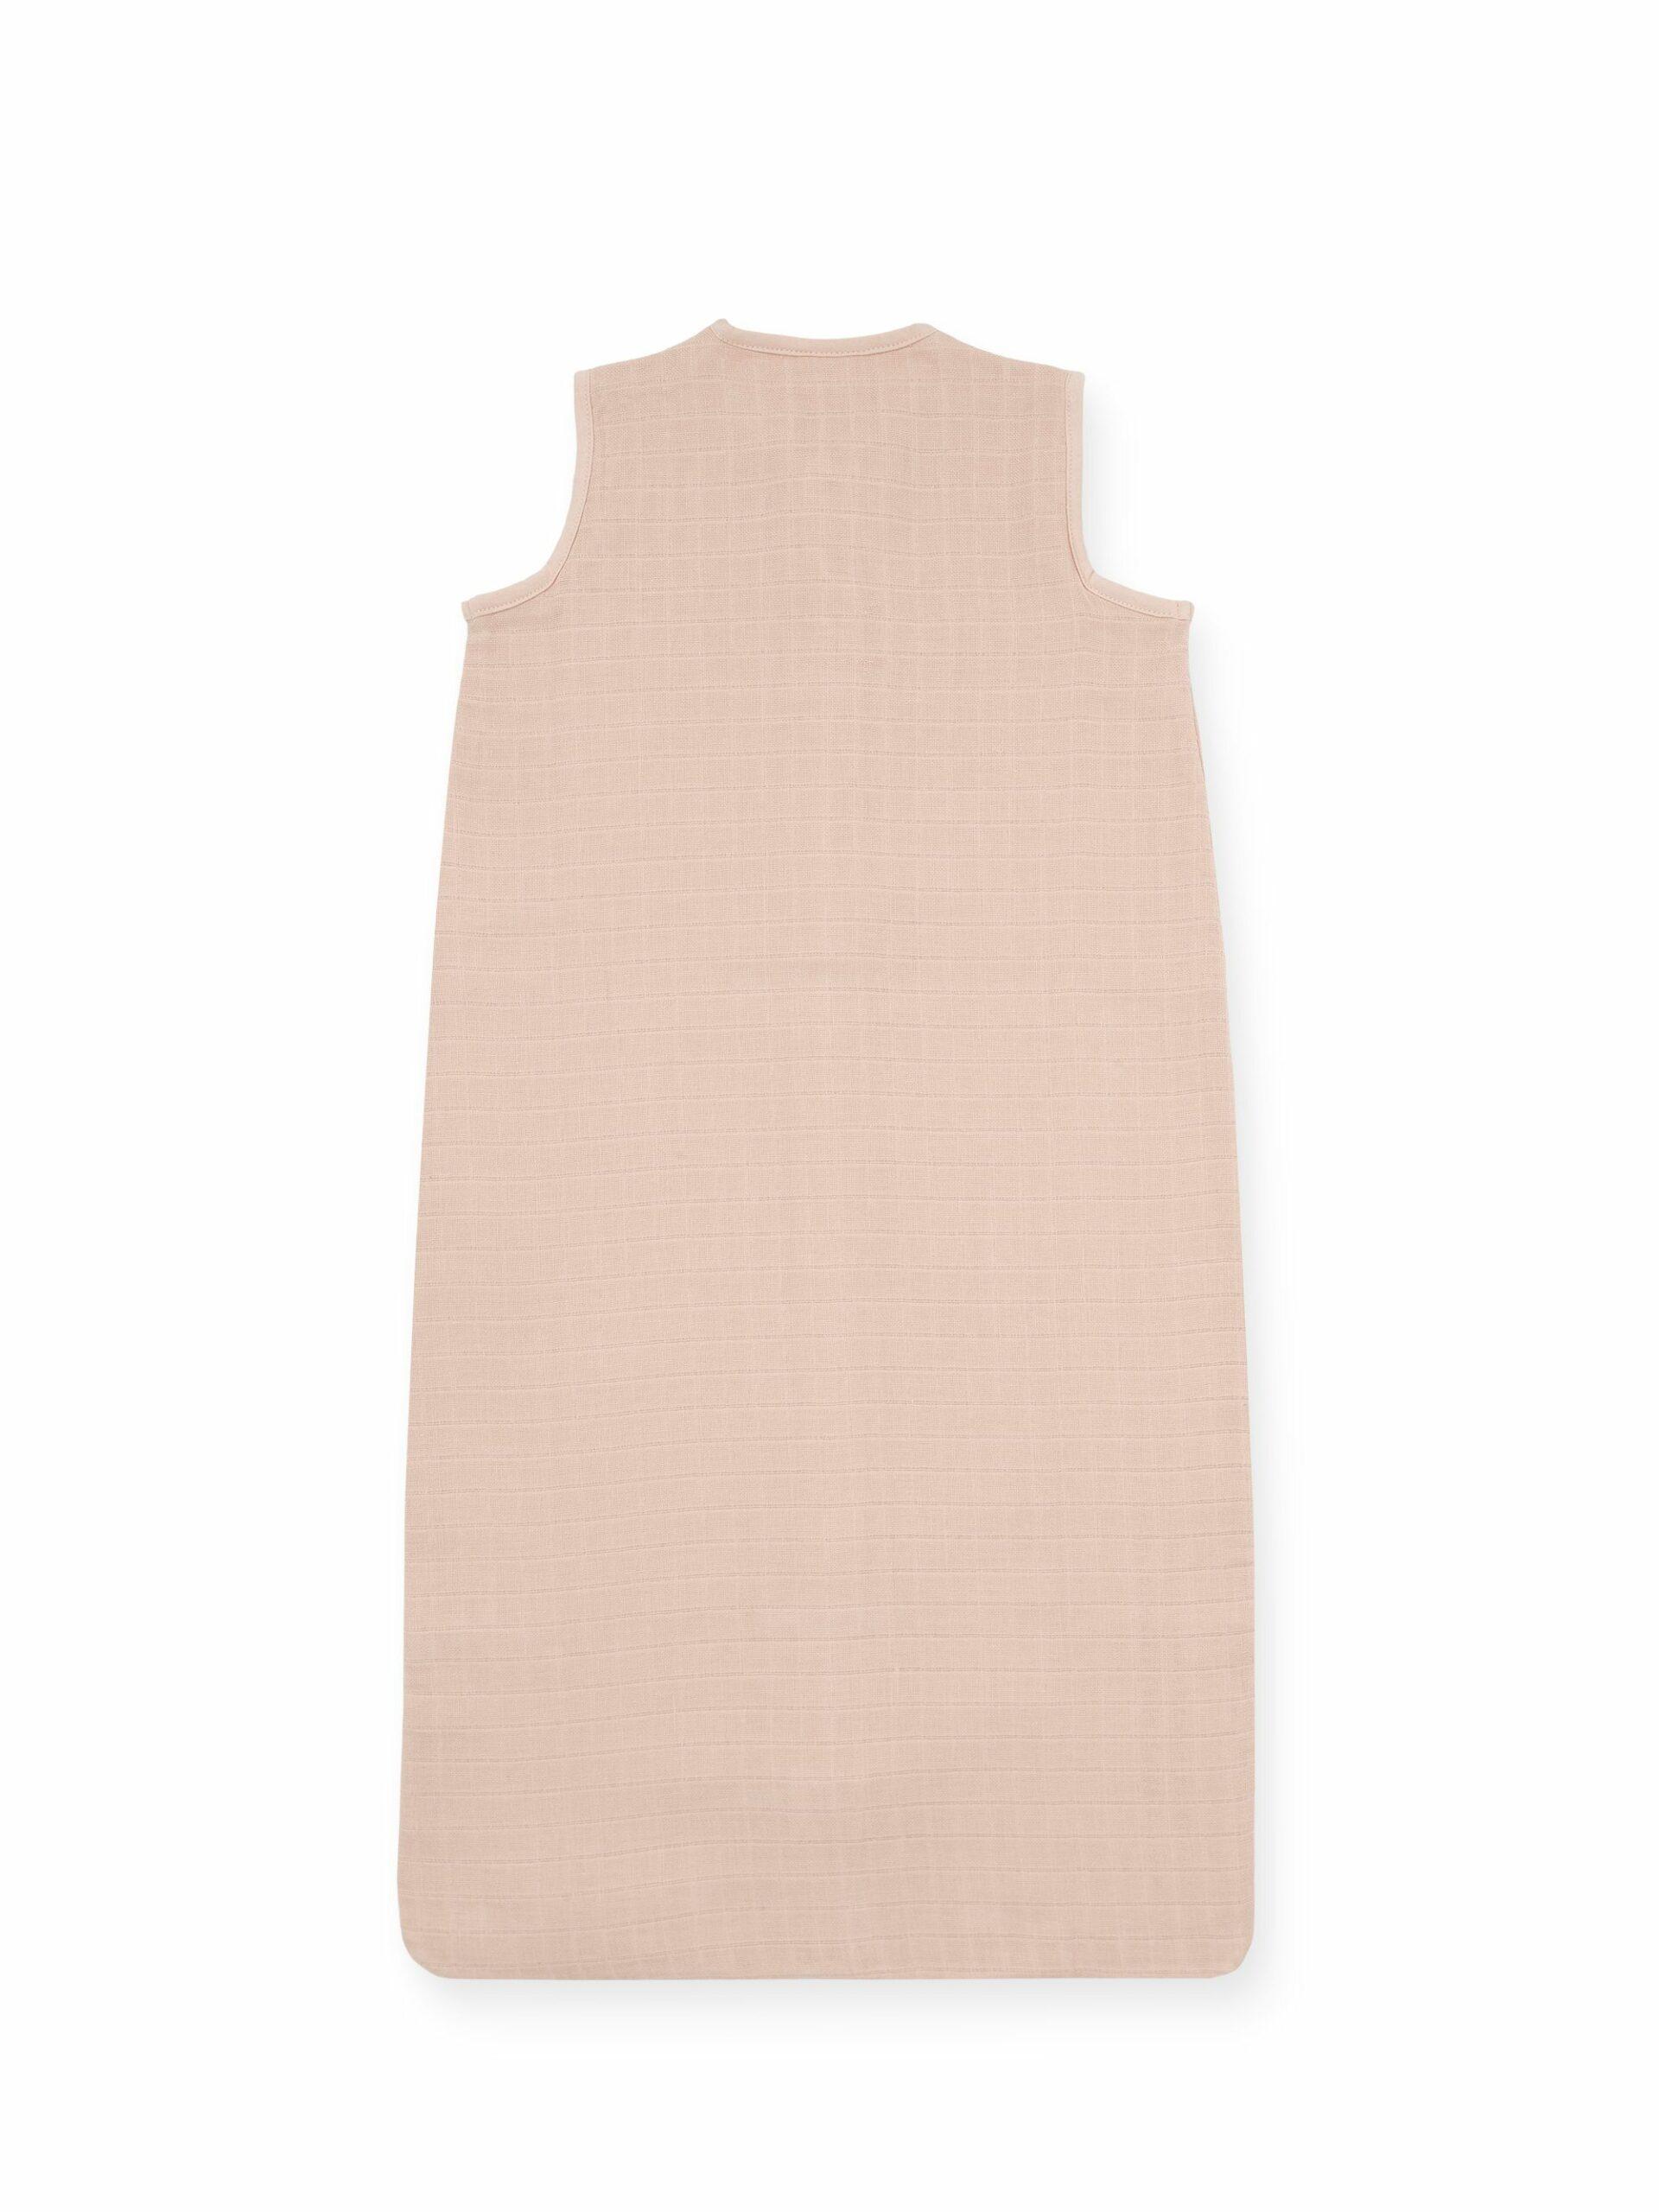 Afbeelding Slaapzak zomer hydrofiel 110cm – Pale pink